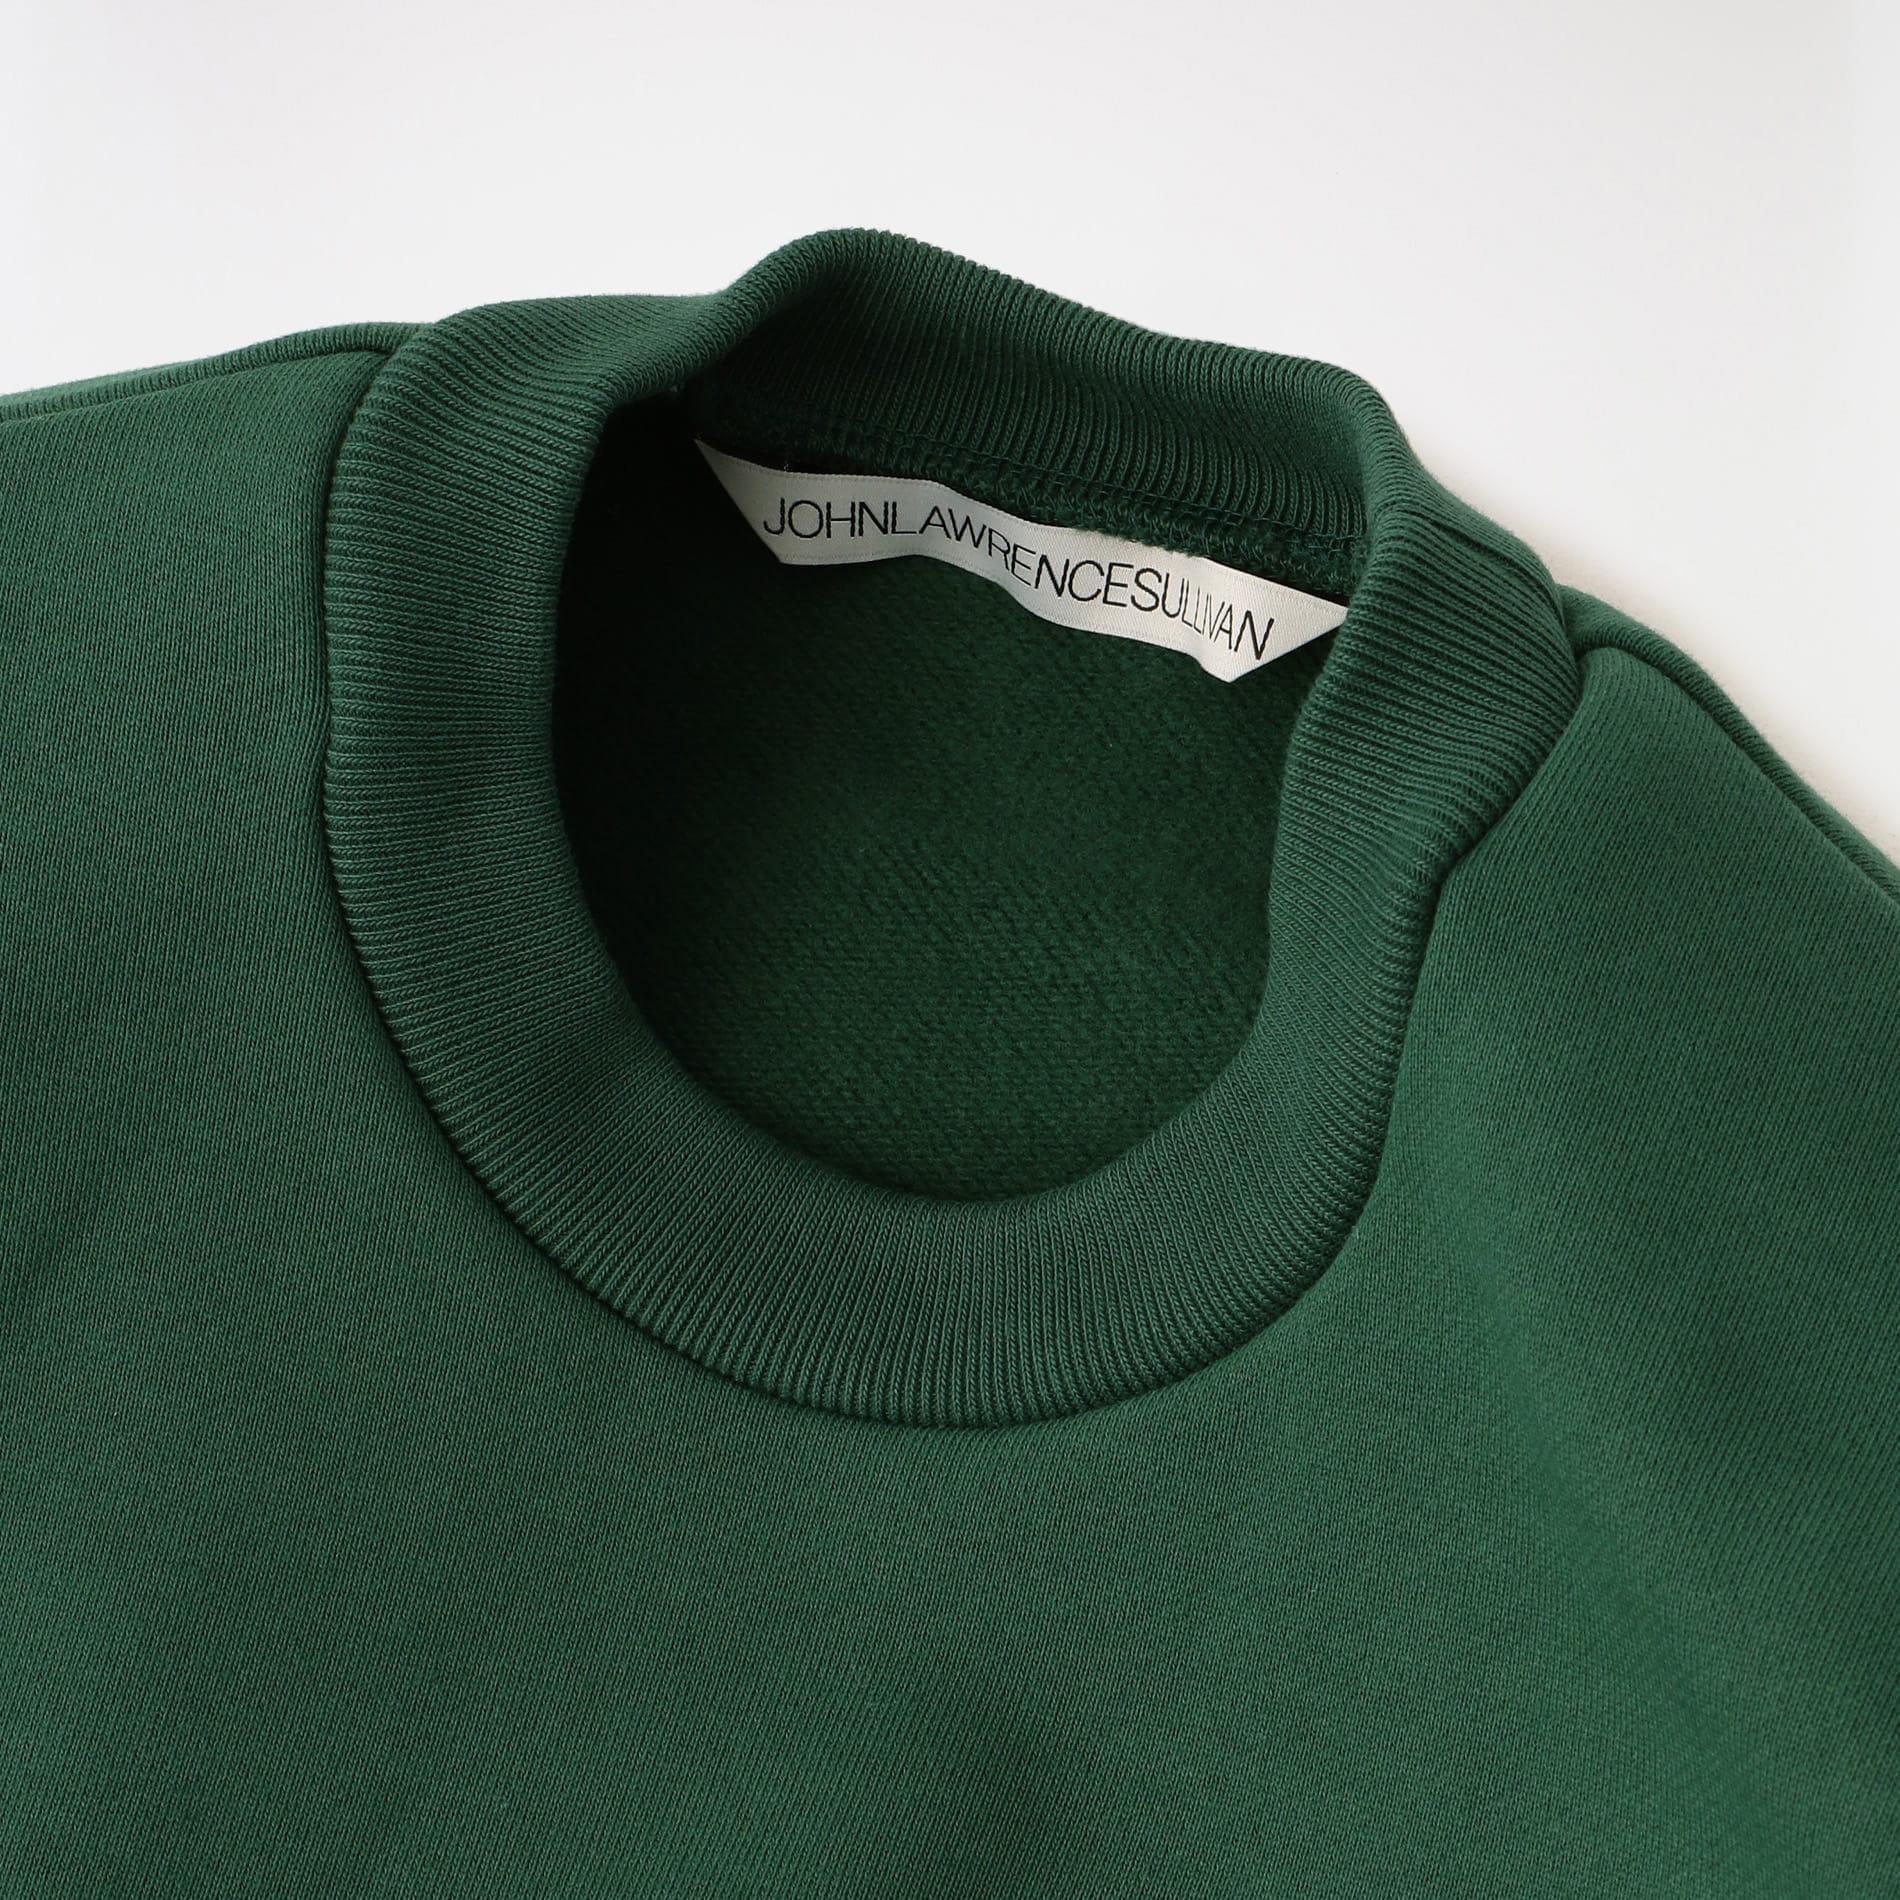 【JOHN LAWRENCE SULLIVAN】WOMEN PRINTED SWEAT DRESS 5D016-1220-22